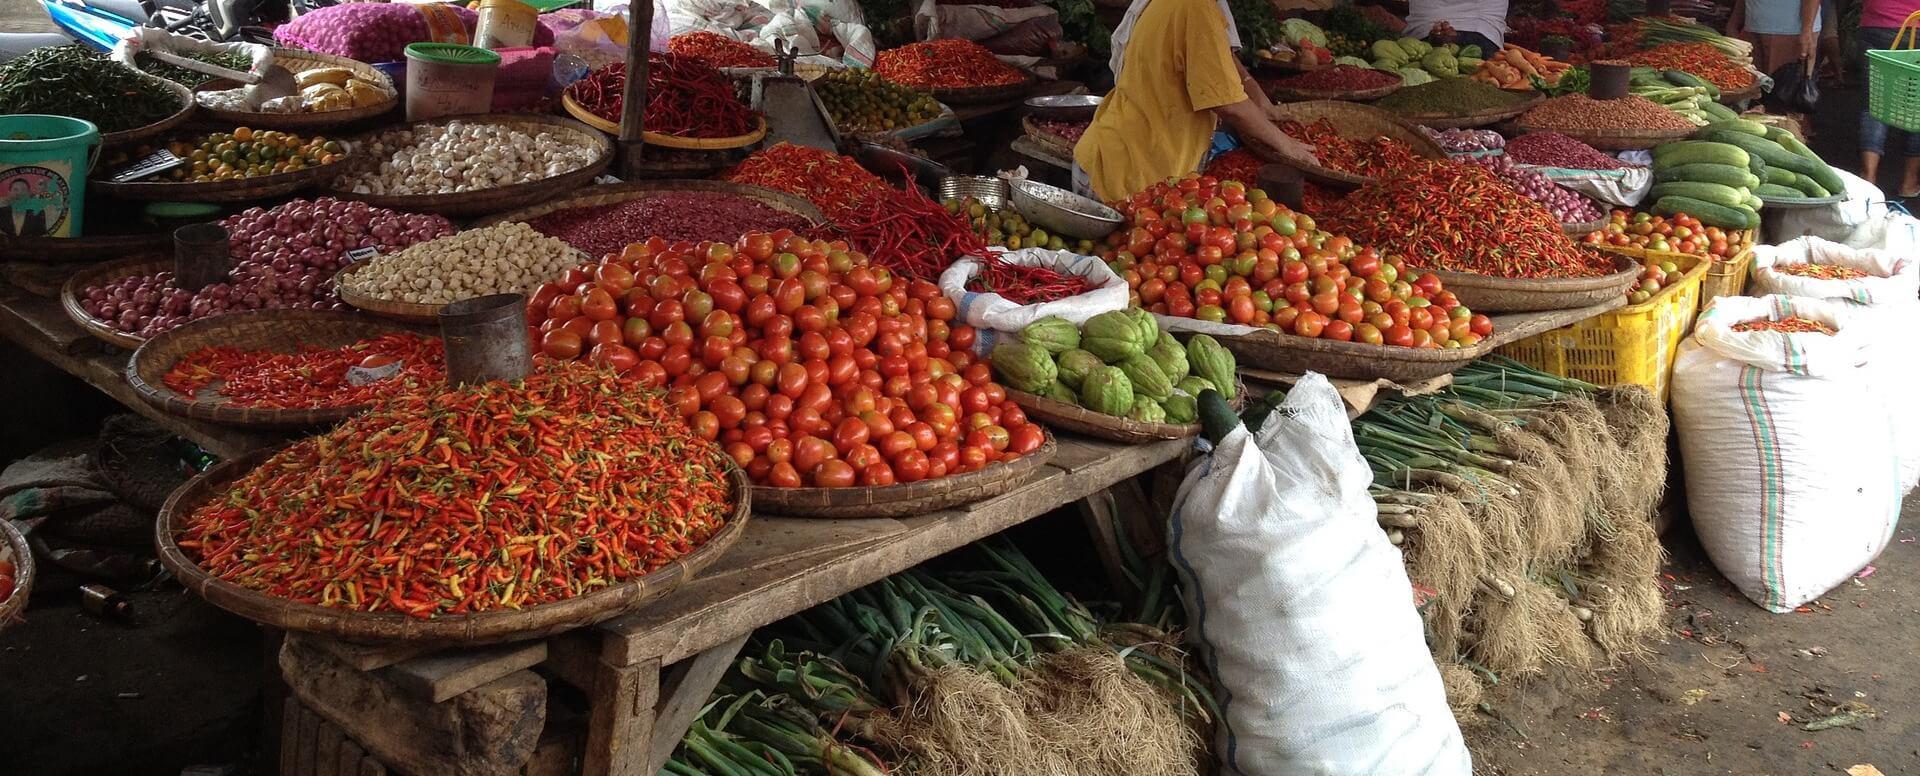 Gastronomy in Indonesia - Indonesia